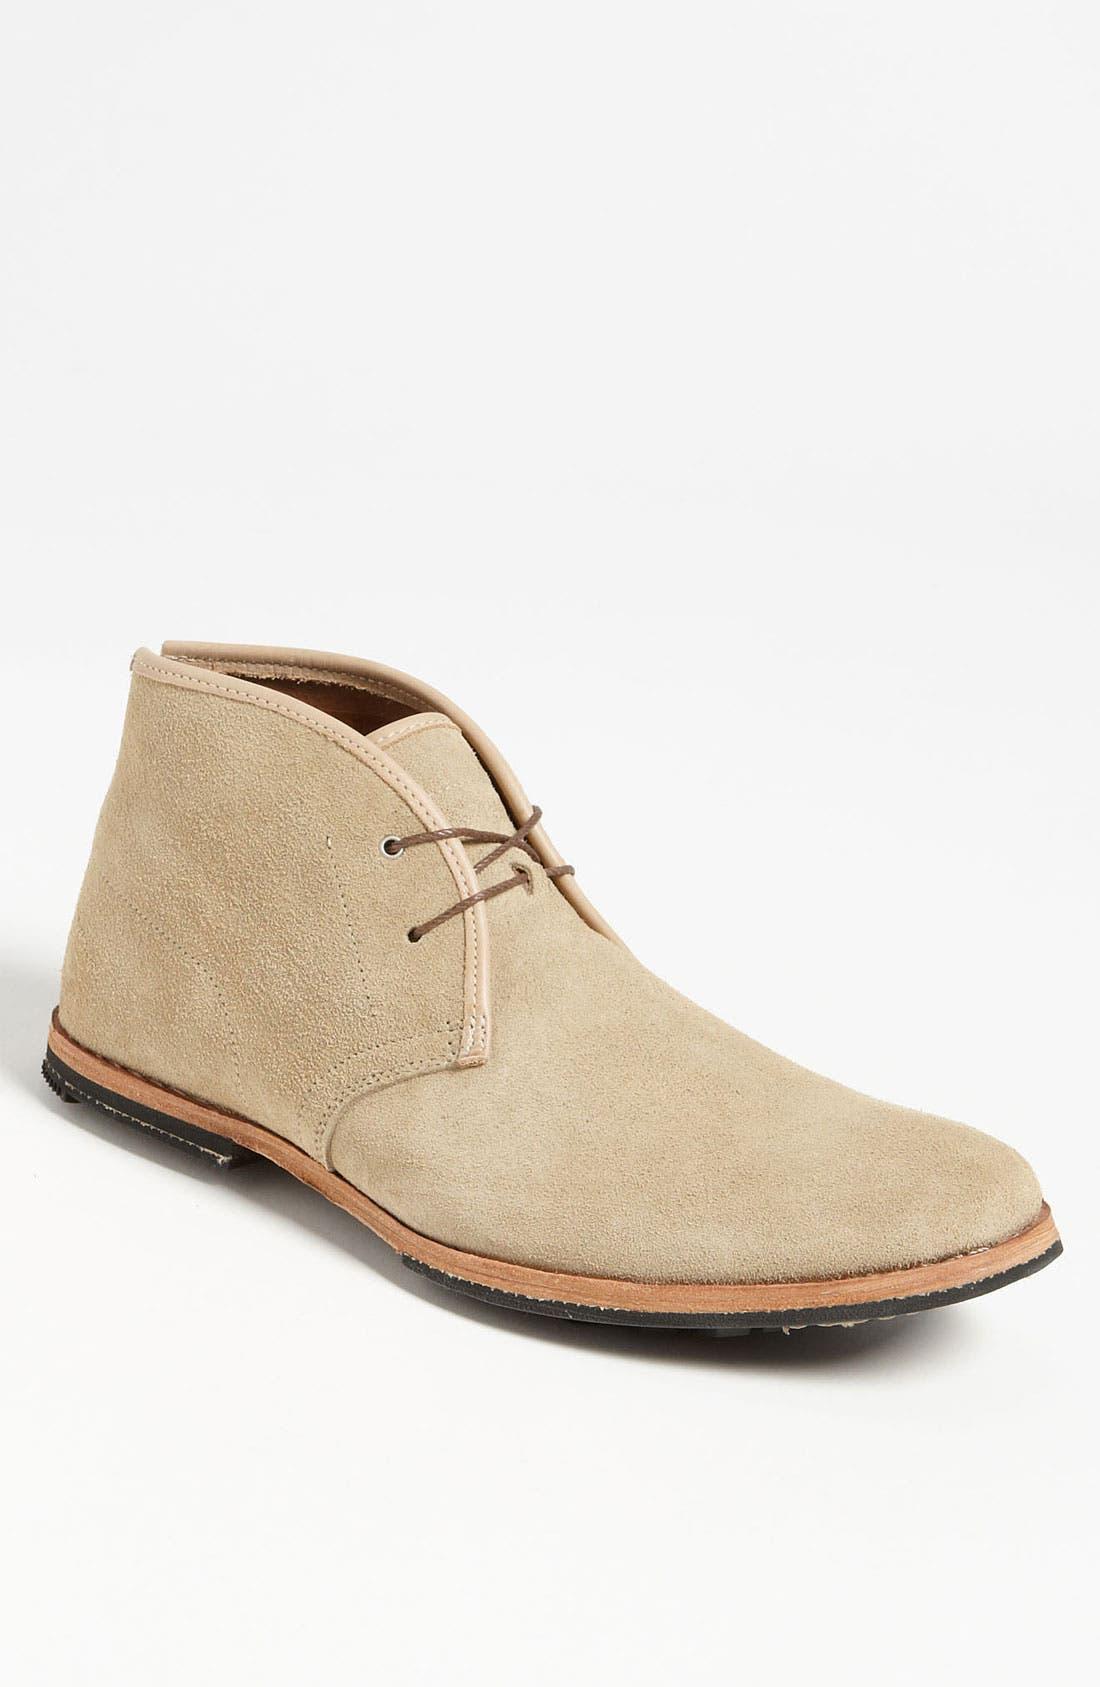 Alternate Image 1 Selected - Timberland Boot Company 'Wodehouse' Chukka Boot